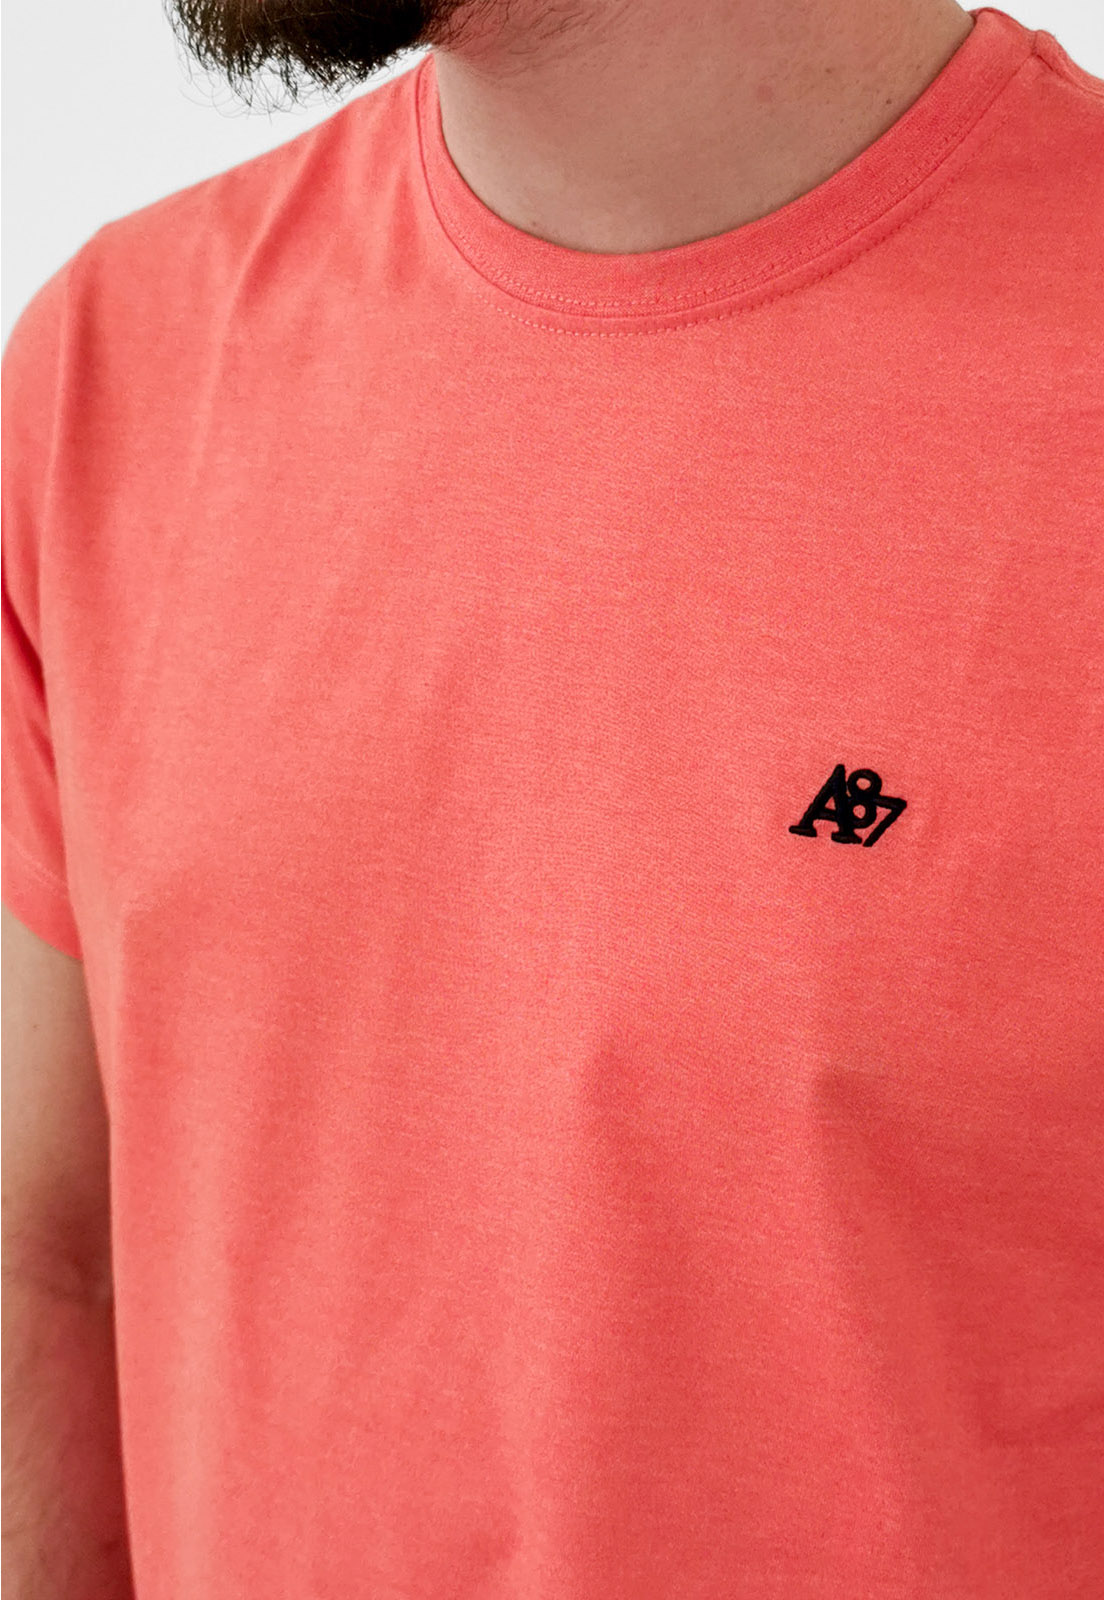 Camiseta Aéropostale Básica Laranja Logo